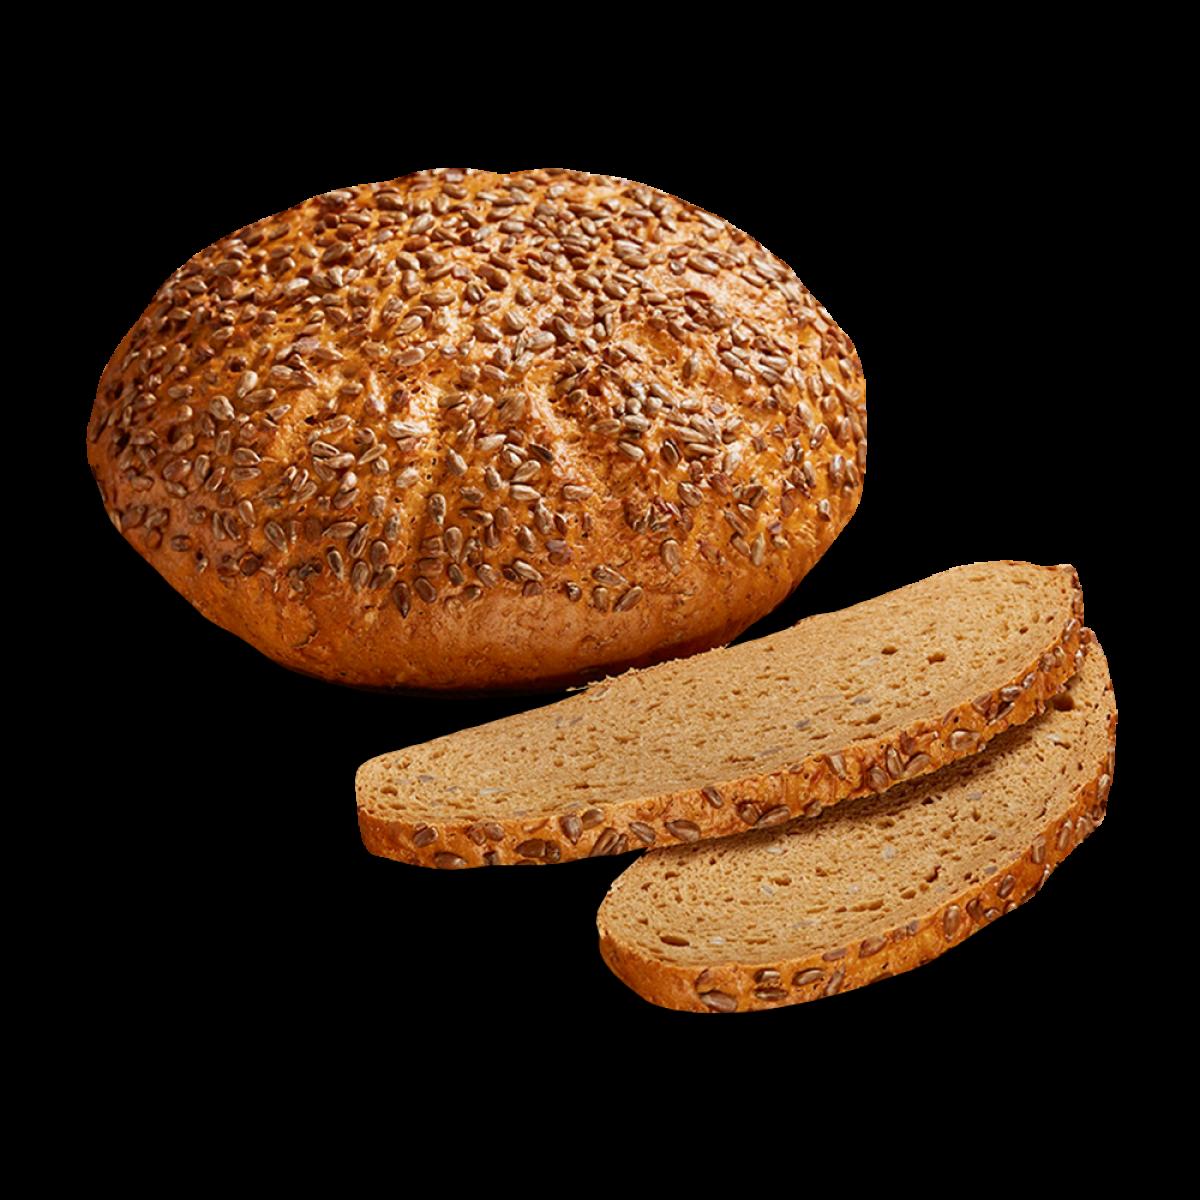 Zonnebloempitten Brood